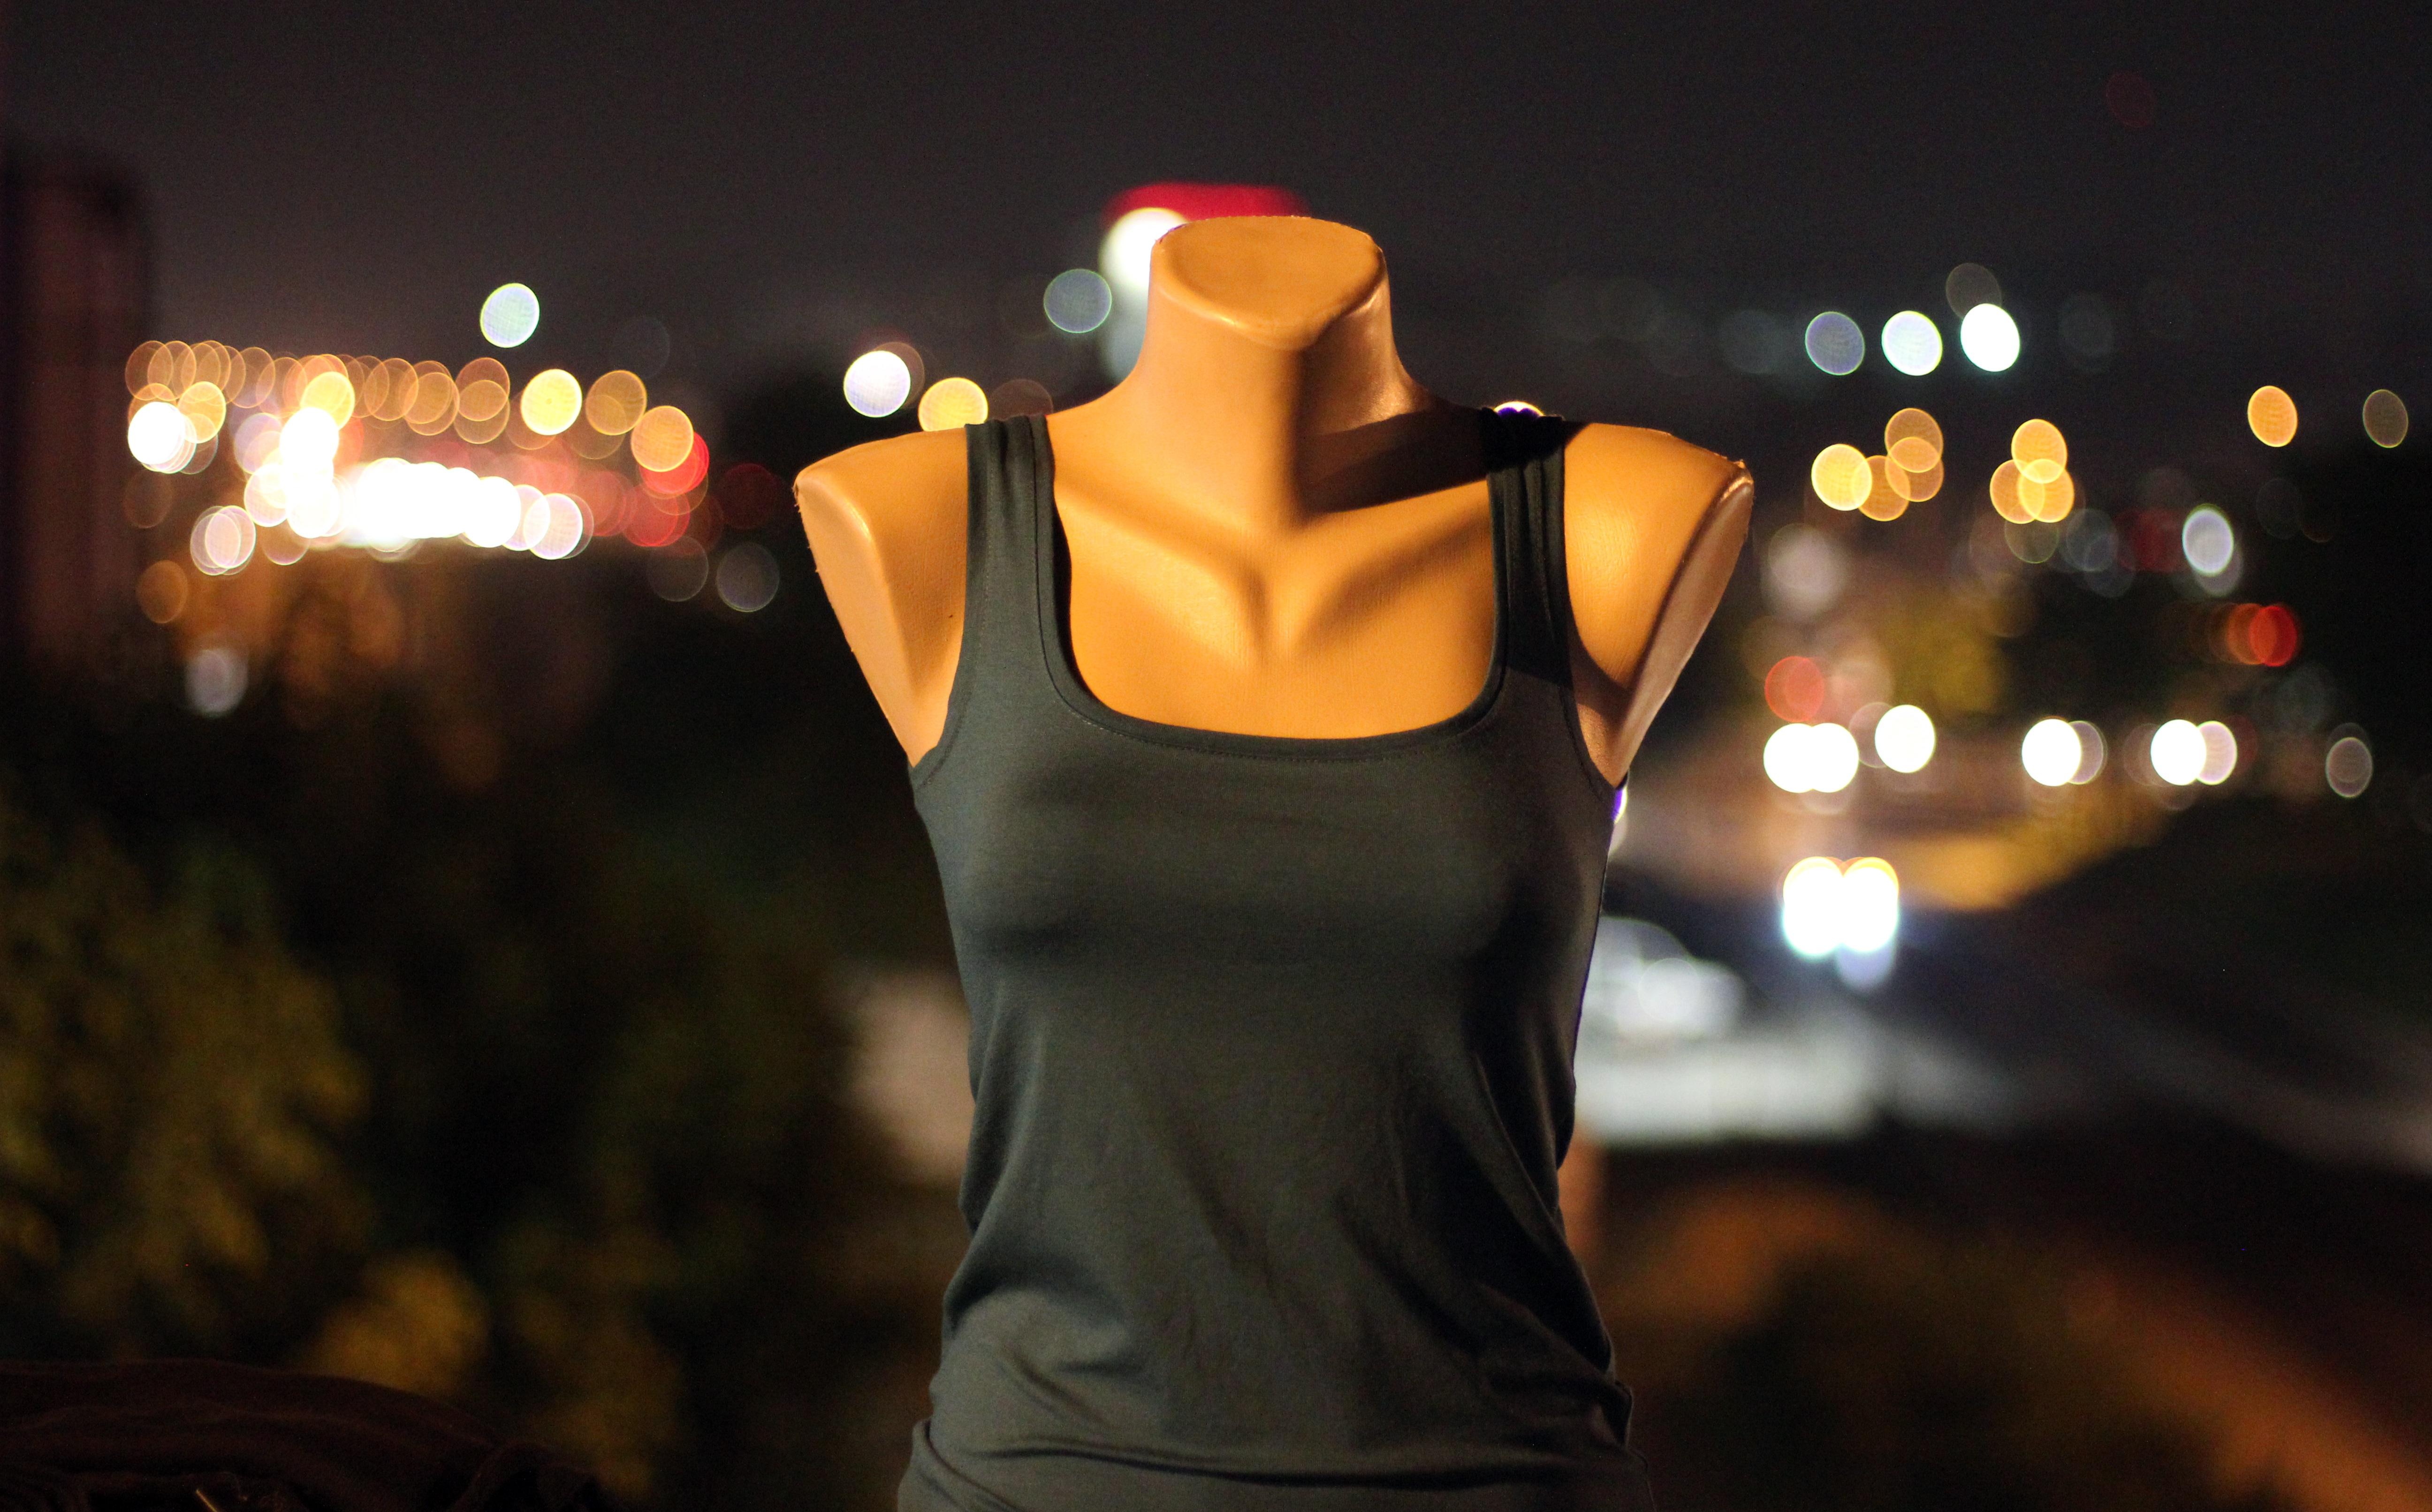 Gambar Cahaya Bokeh Wanita Artis Kegelapan Mode Perbelanjaan